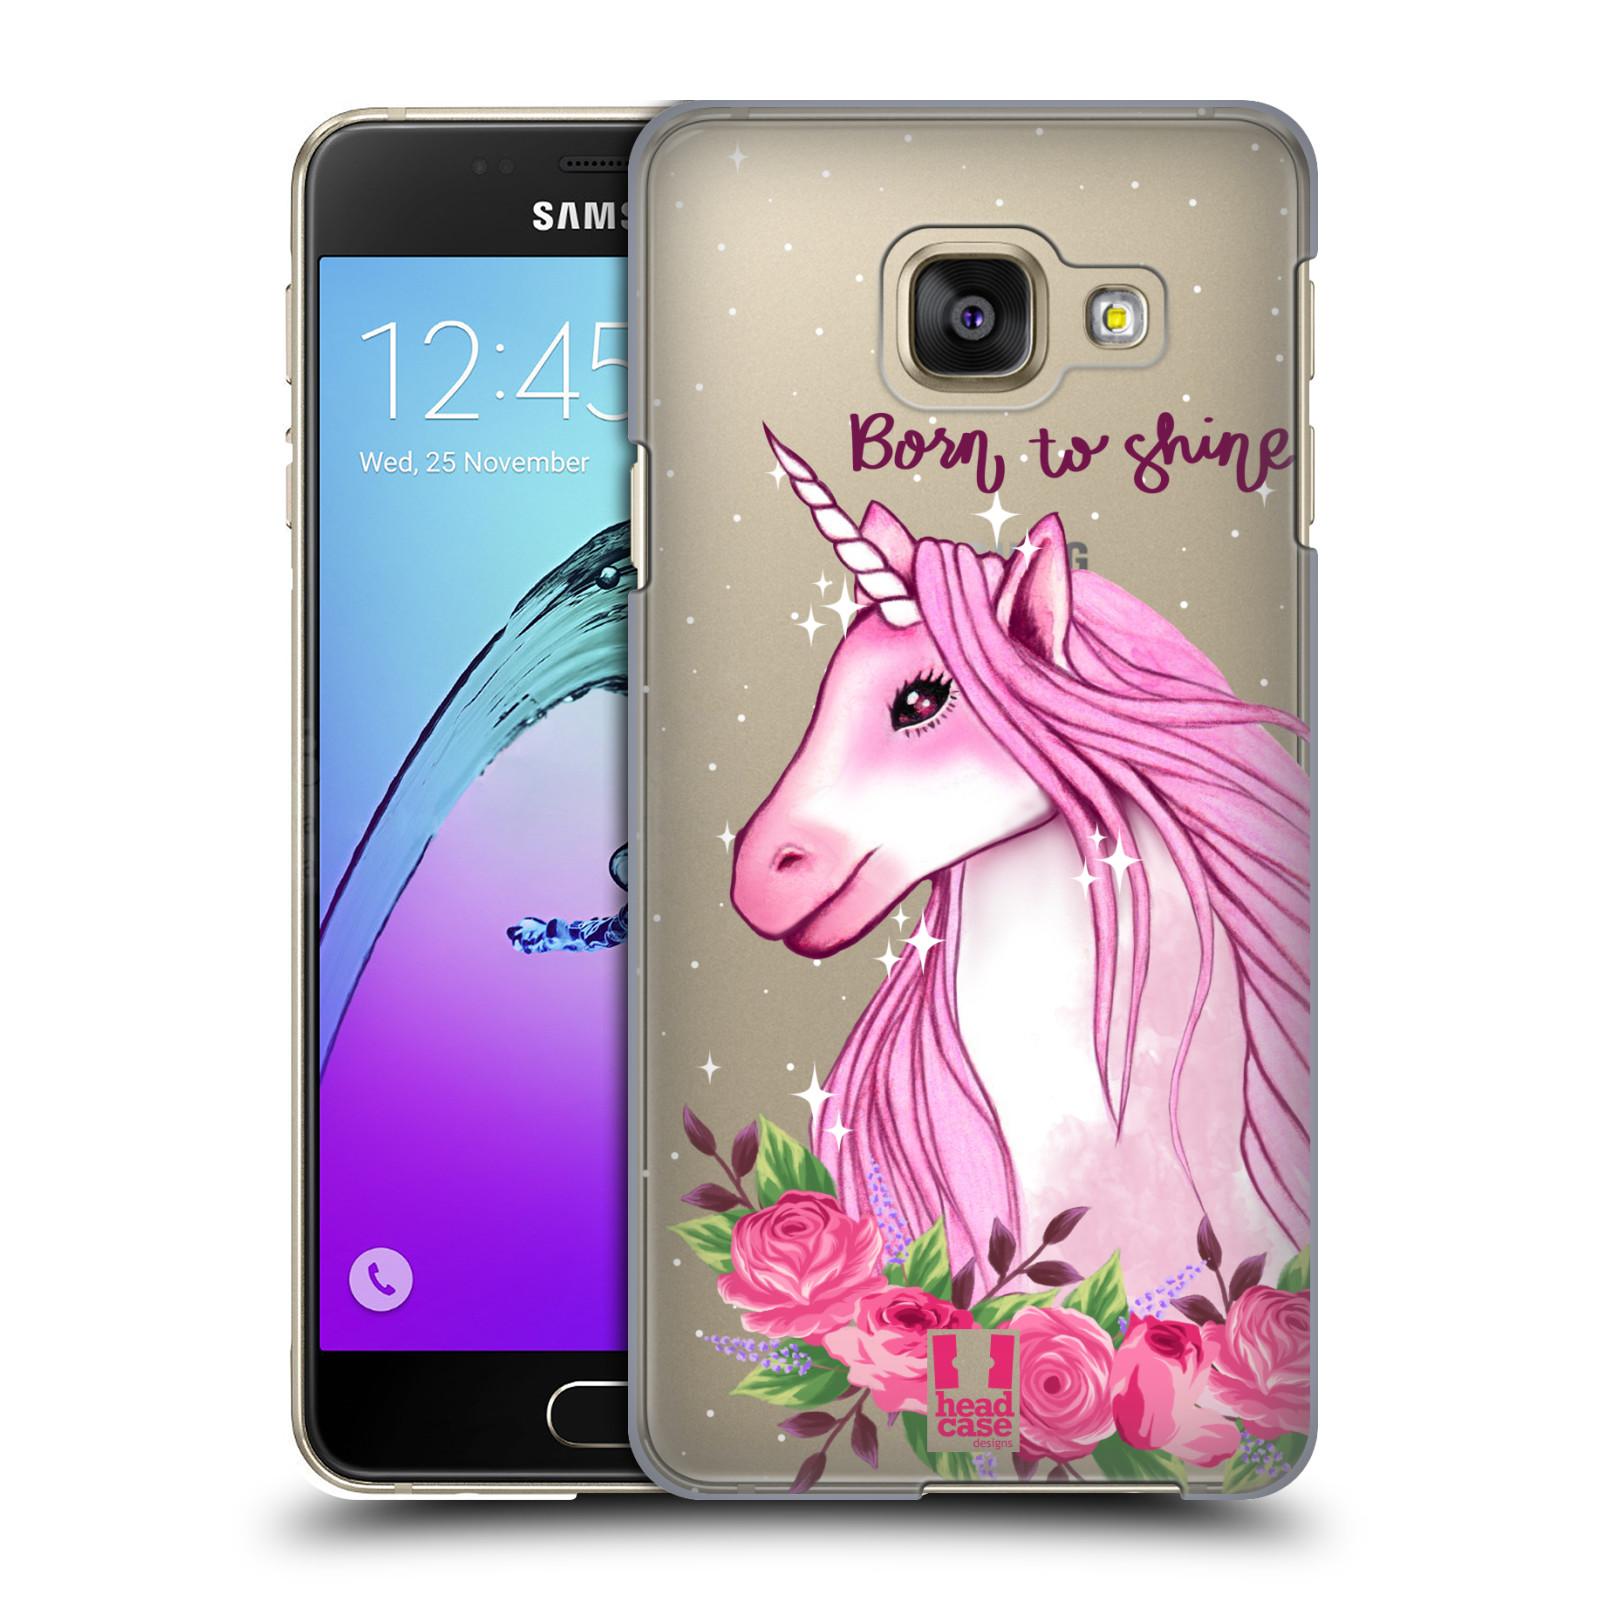 Plastové pouzdro na mobil Samsung Galaxy A3 (2016) - Head Case - Jednorožec - Born to shine